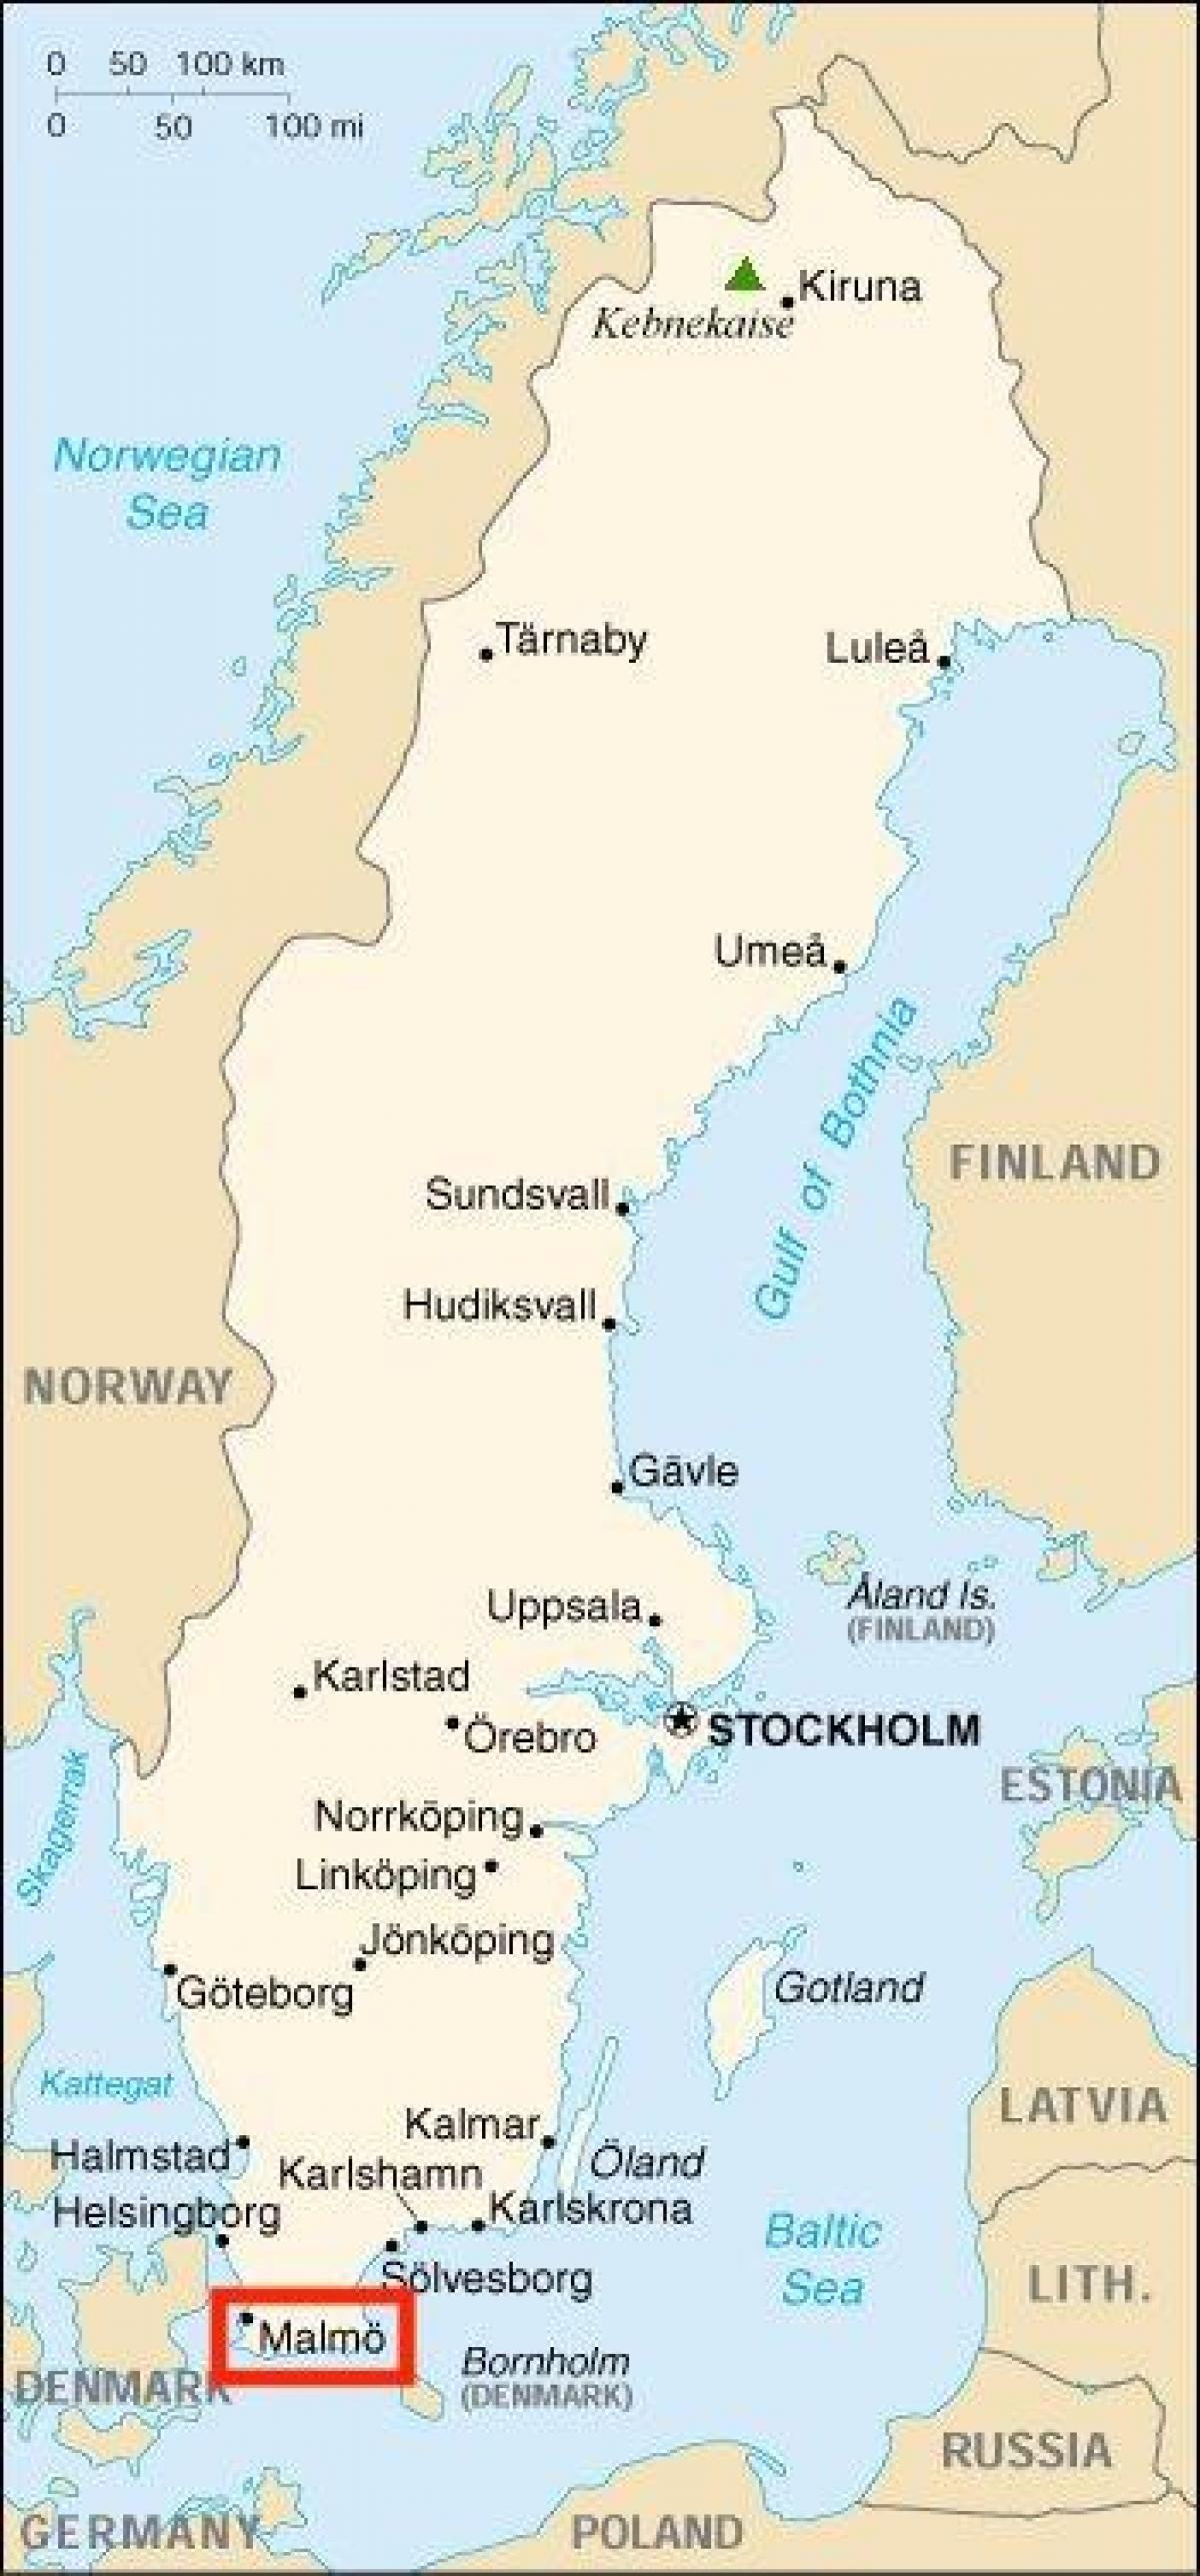 kart over malmø Malmö, Sverige kart   Sverige malmö kart (Nord Europa   Europa) kart over malmø